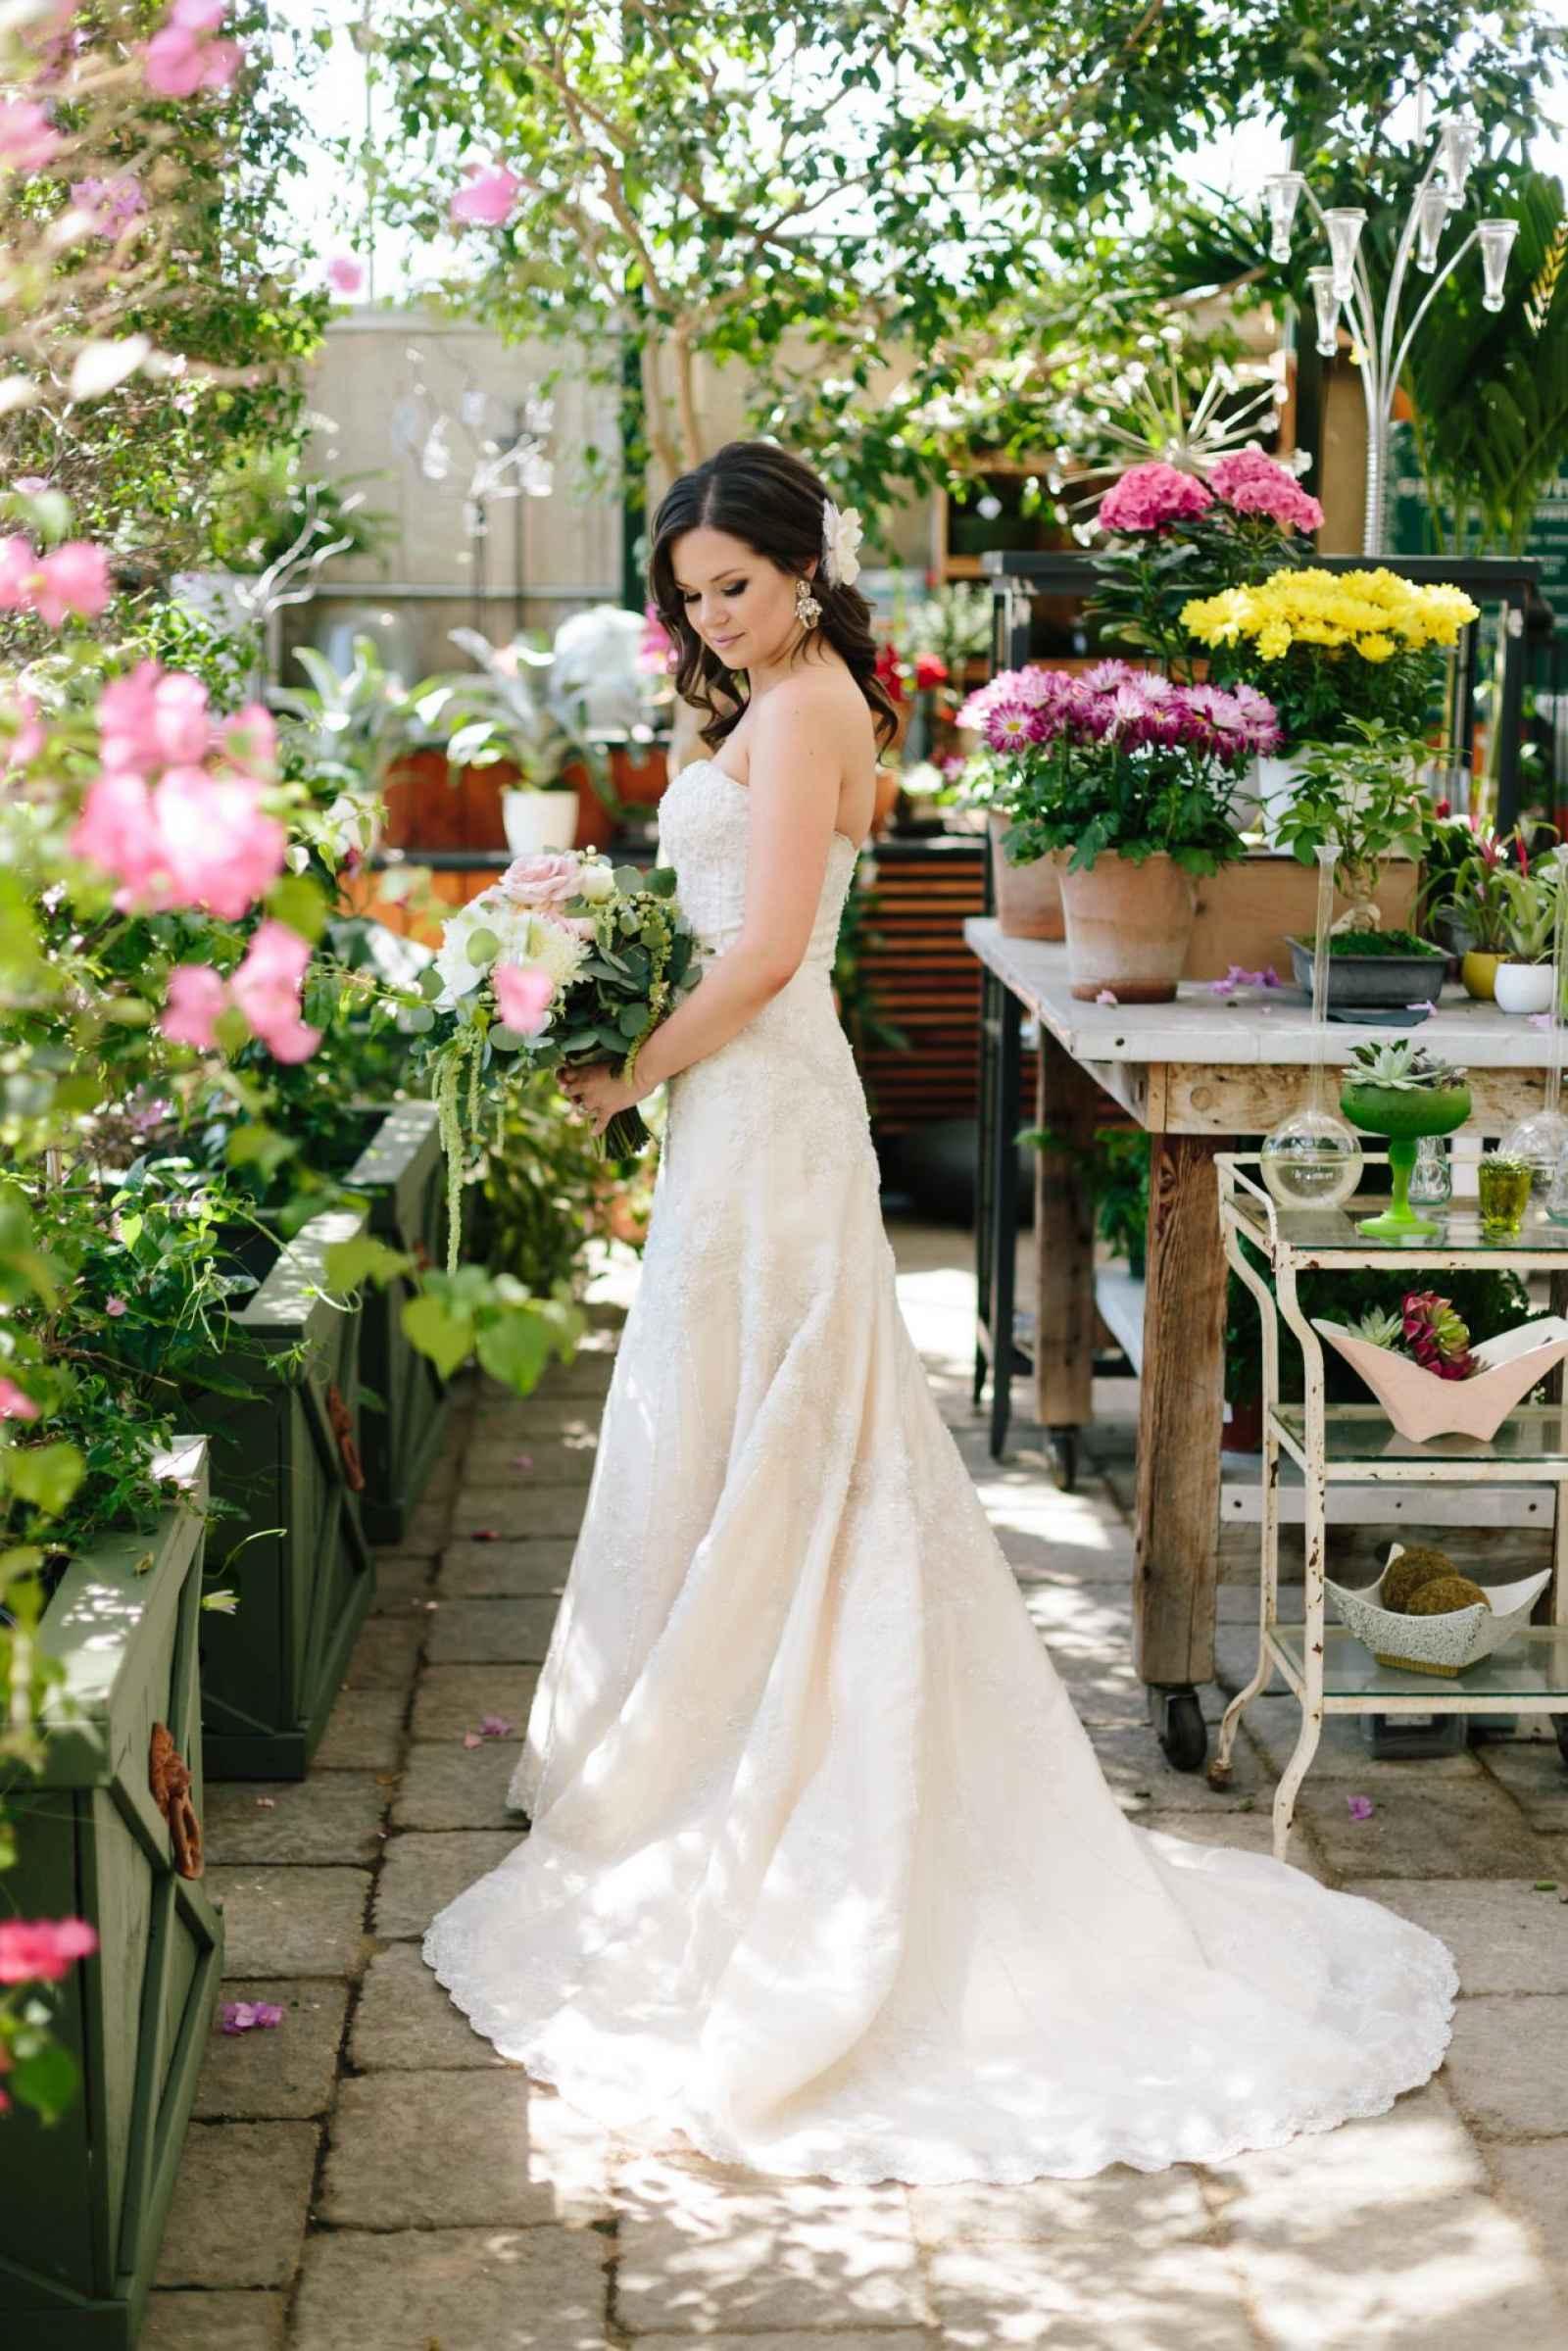 the wedding story of trevor and pawl weddingday